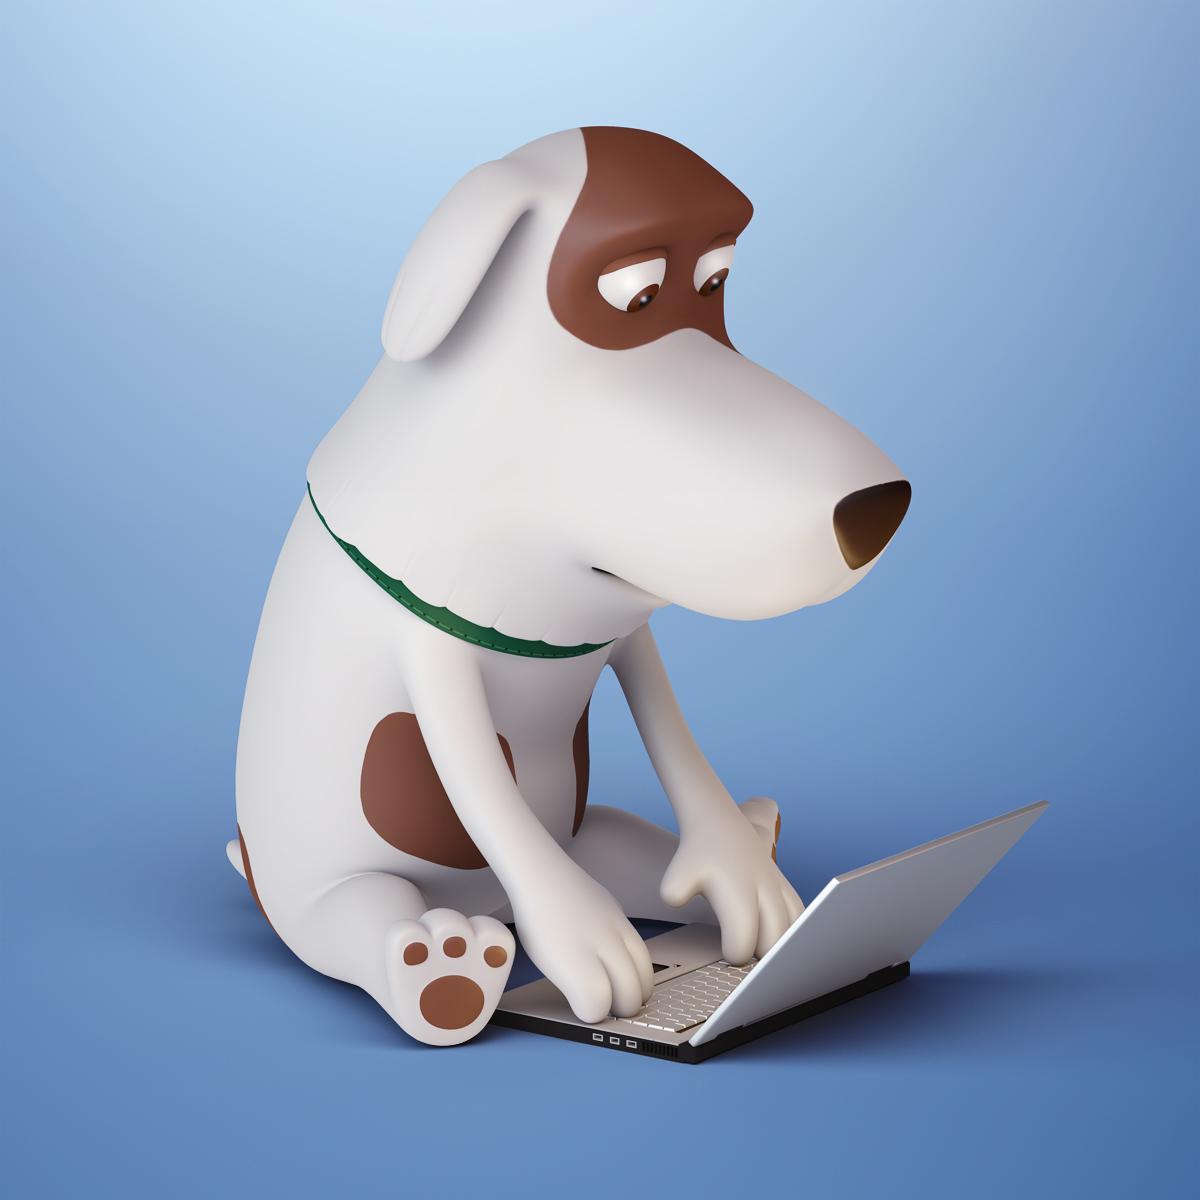 Optimum-Wifi-Hot-Spot-dog_04_o.jpg